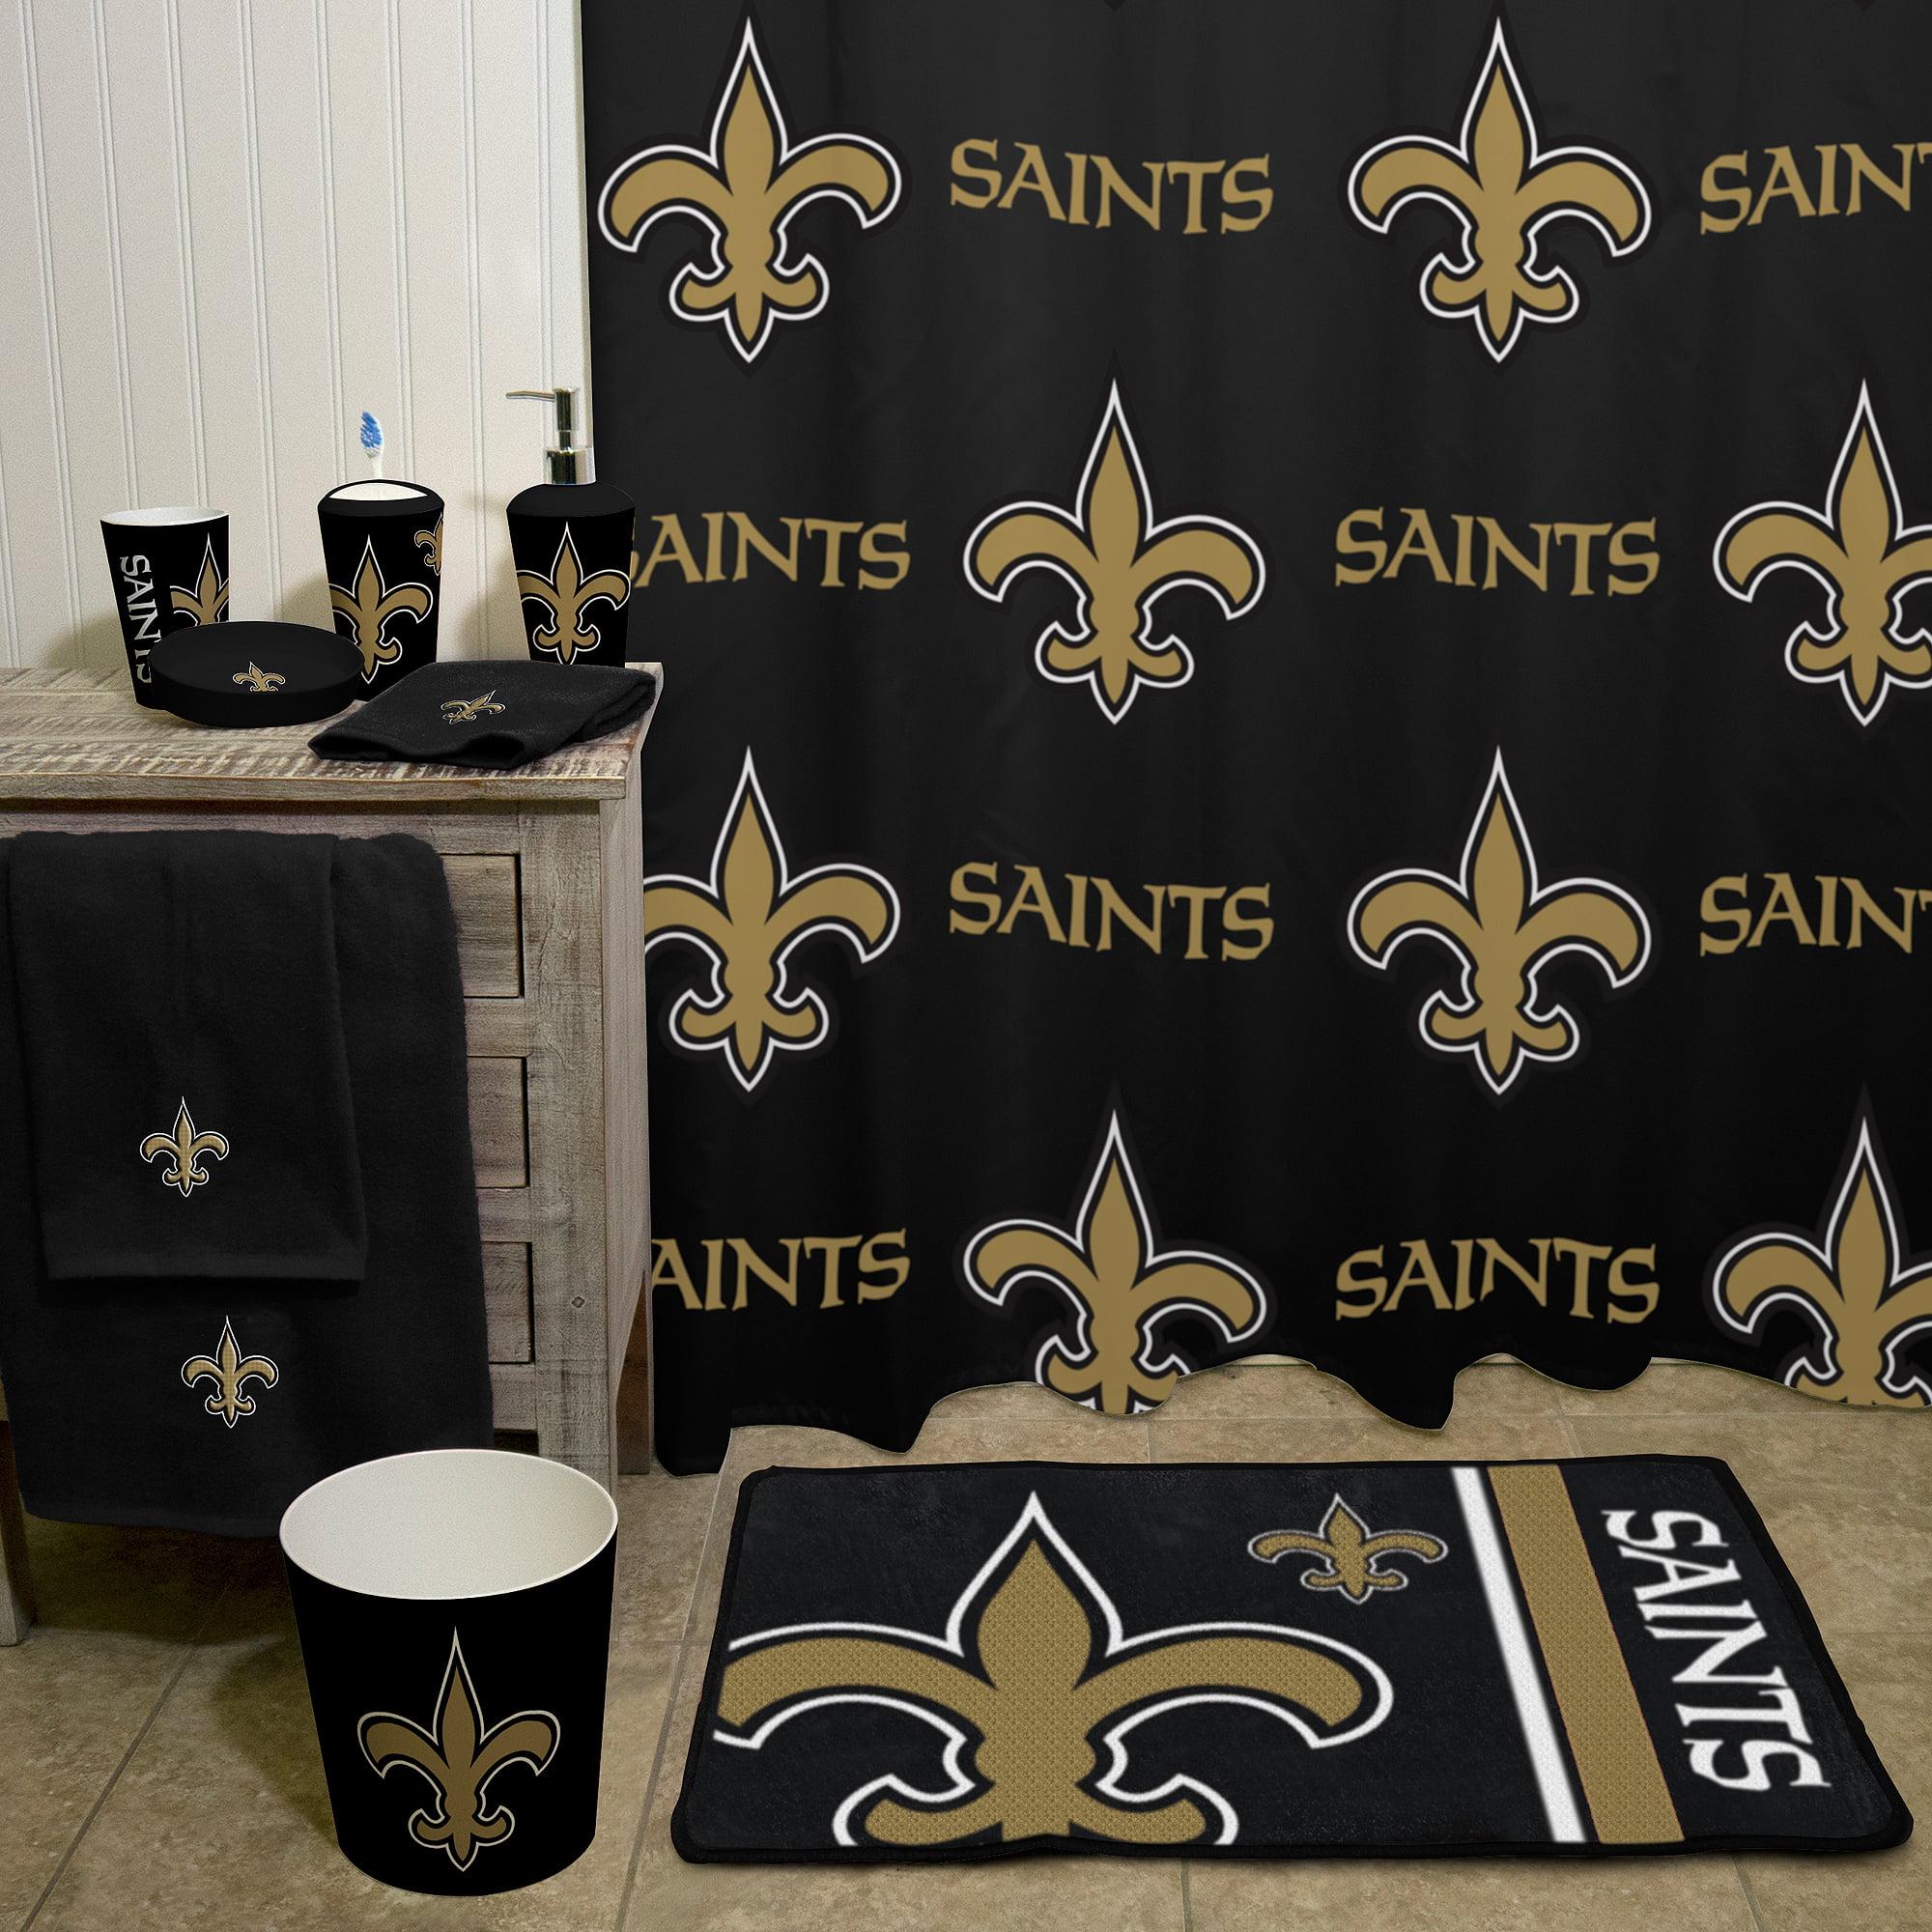 Saints Bathroom Set 28 Images New Orleans Saints Nfl Bath Tumbler Toothbrush Holder New